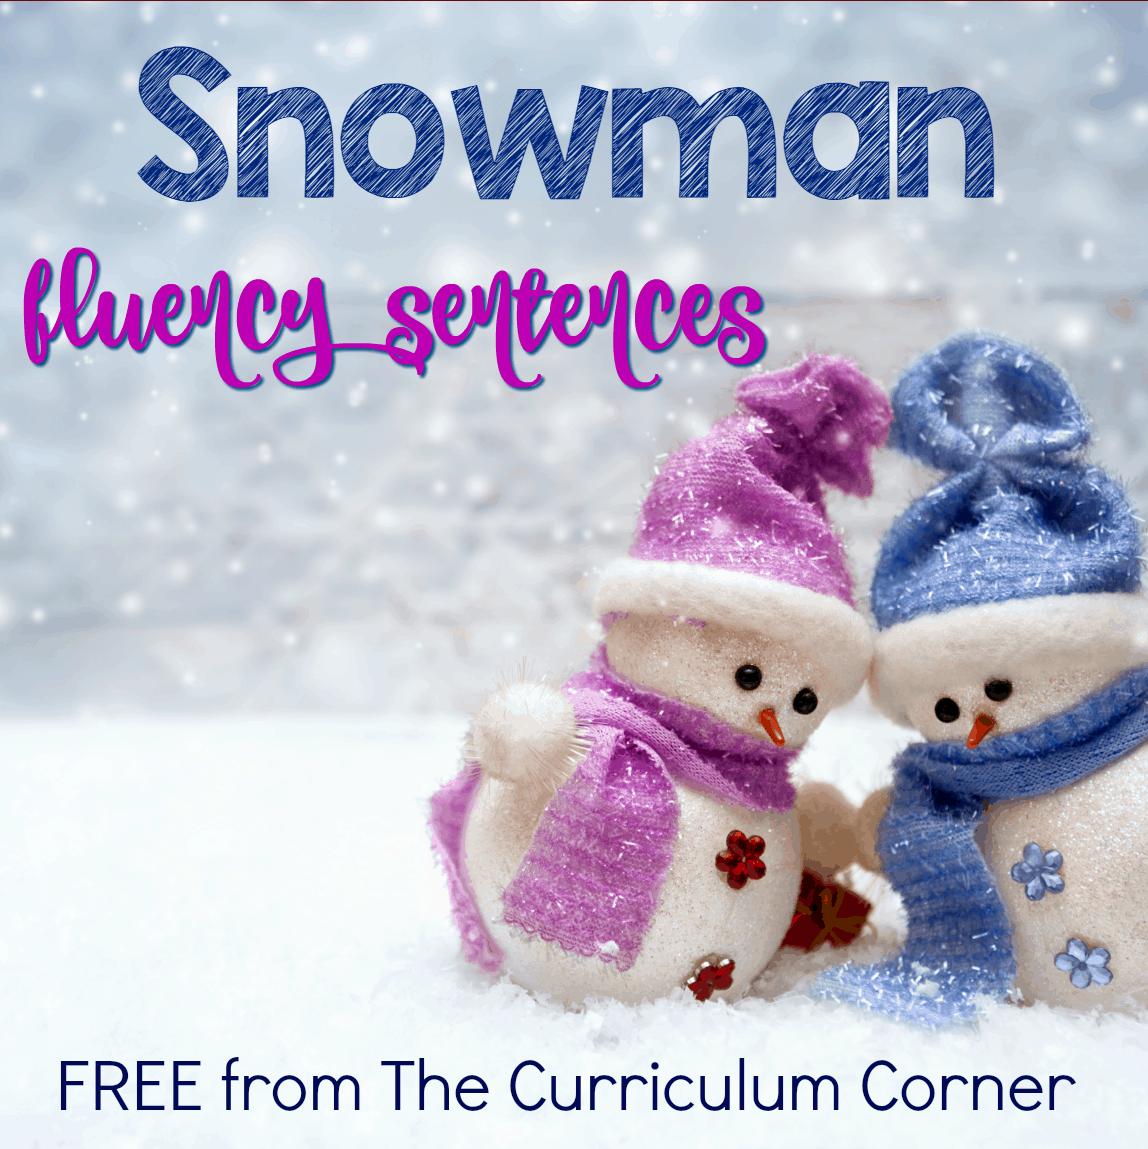 Snowman Fluency Sentences